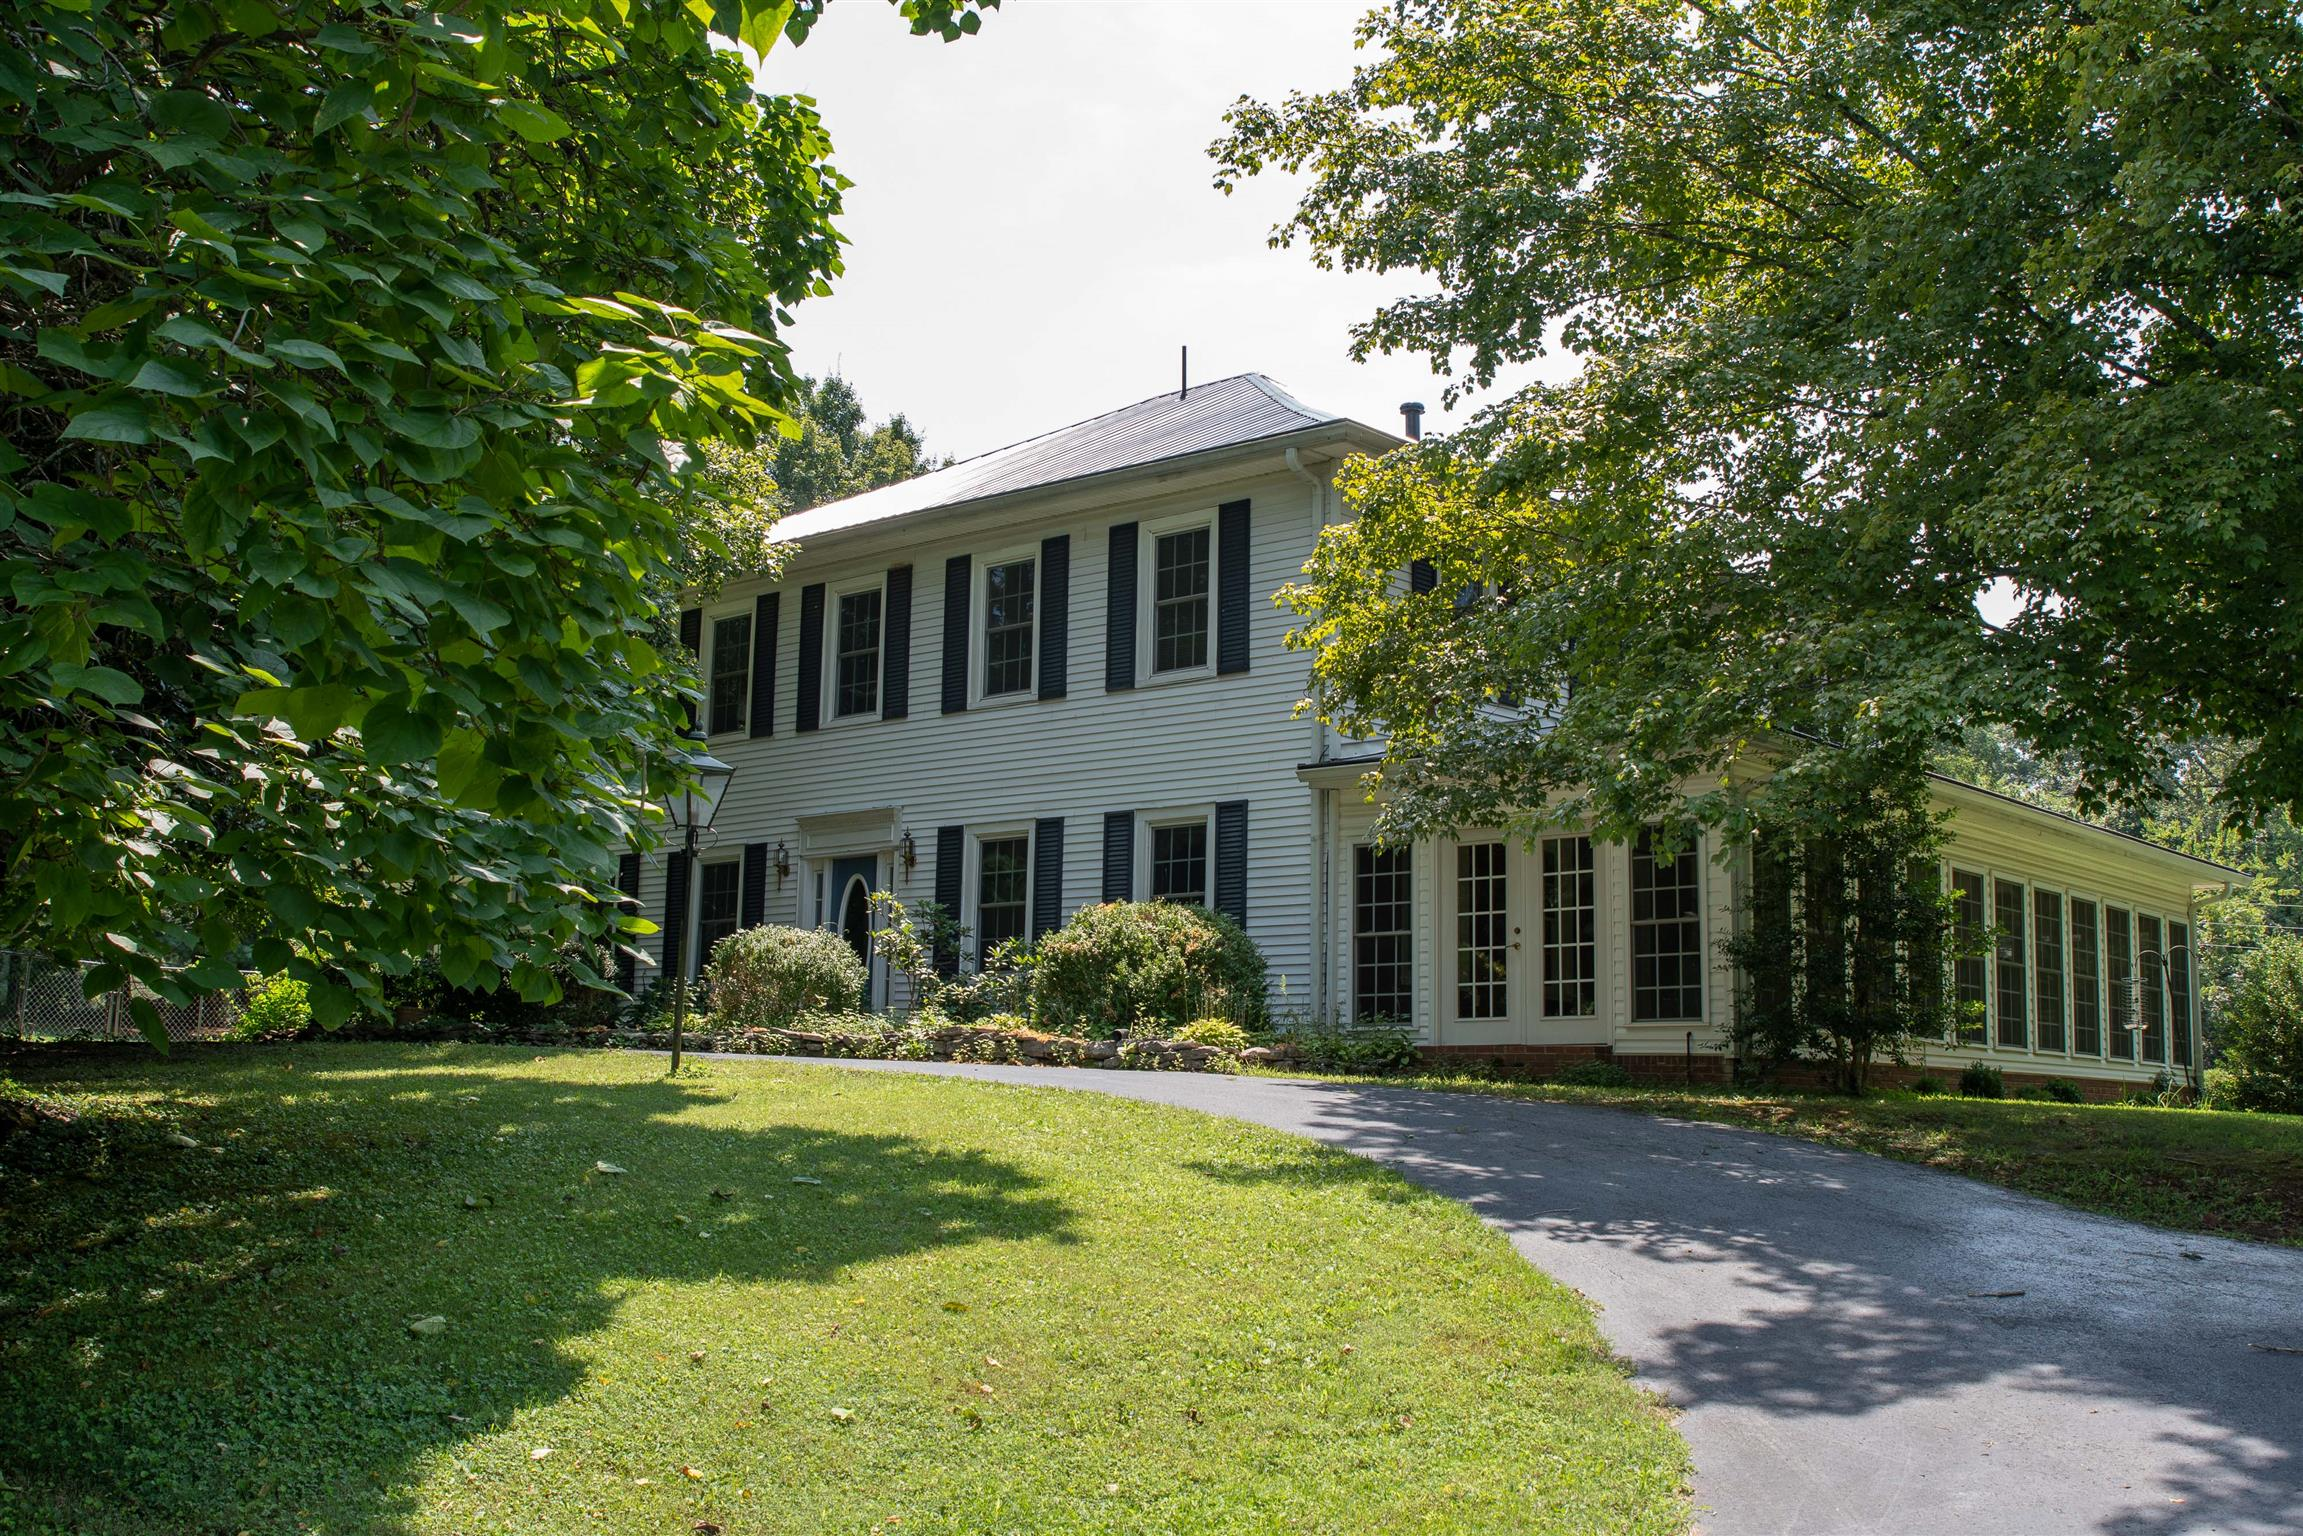 136 Deerwood Rd, Clarksville, Tennessee